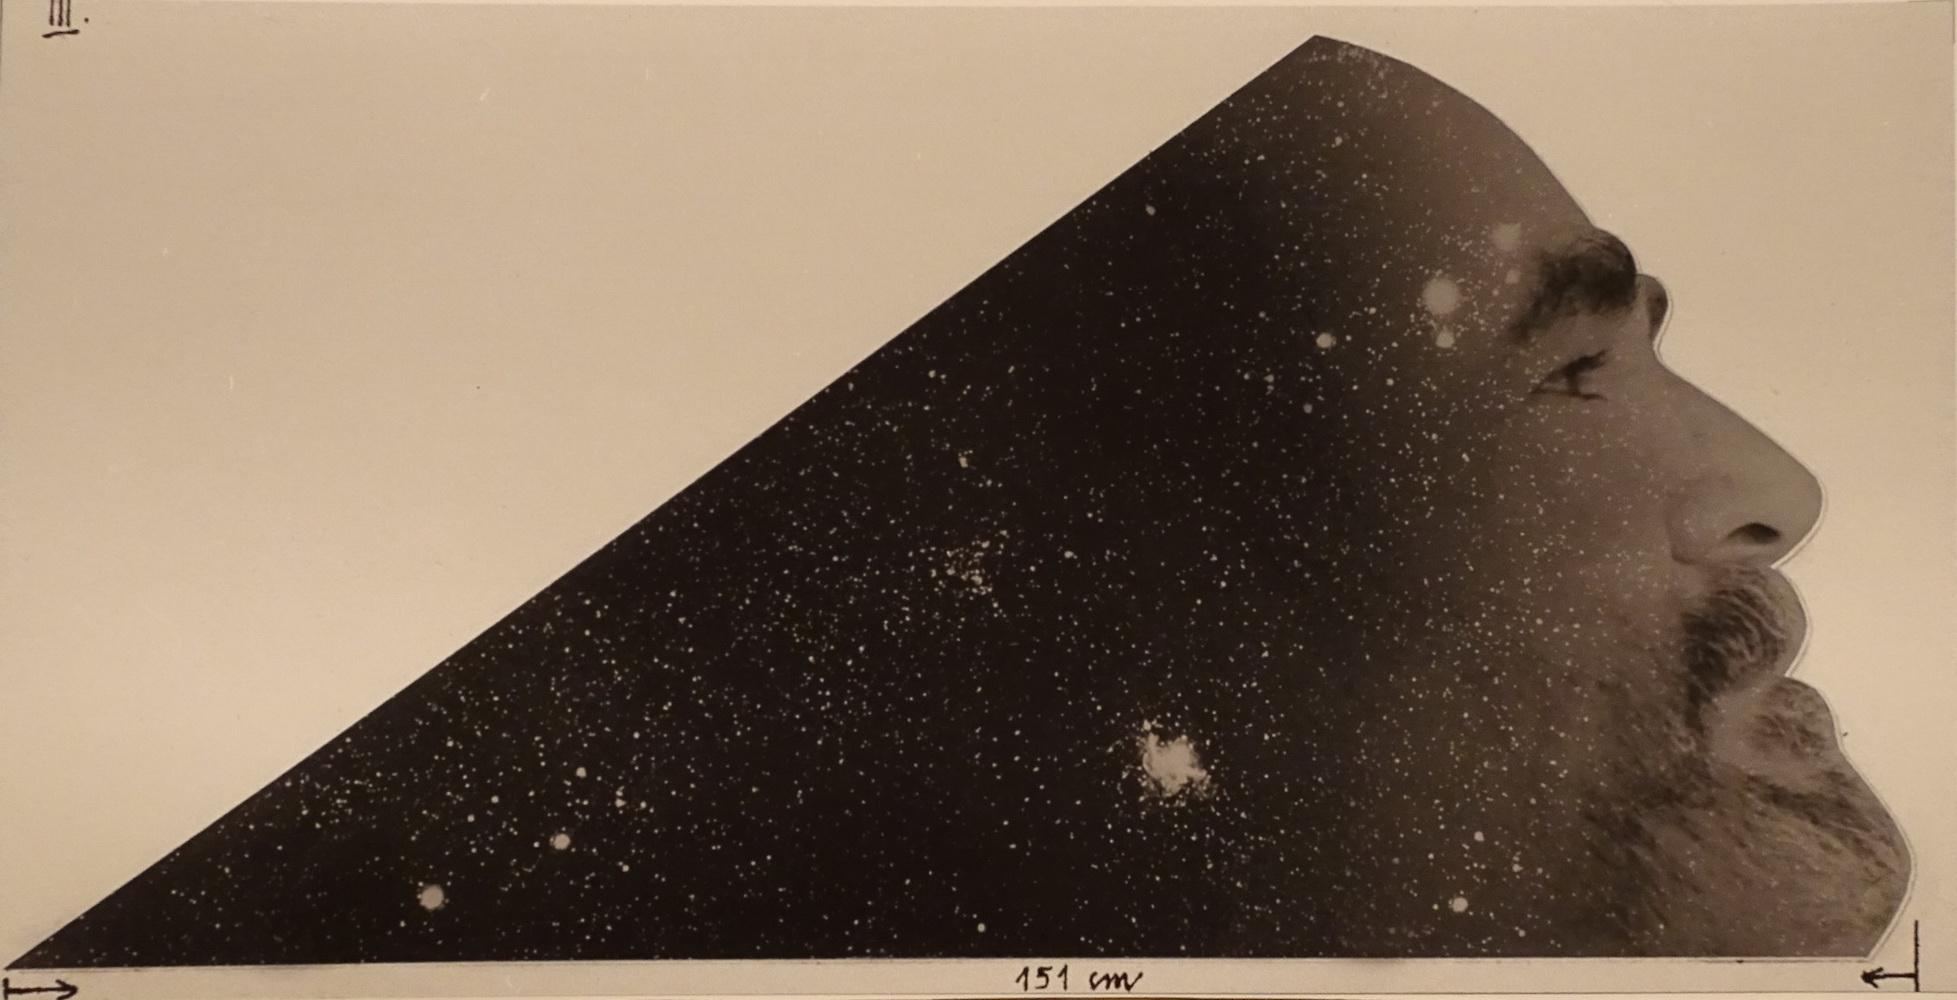 1995, Pozorovateľ 2, serigrafia, 22x44 cm